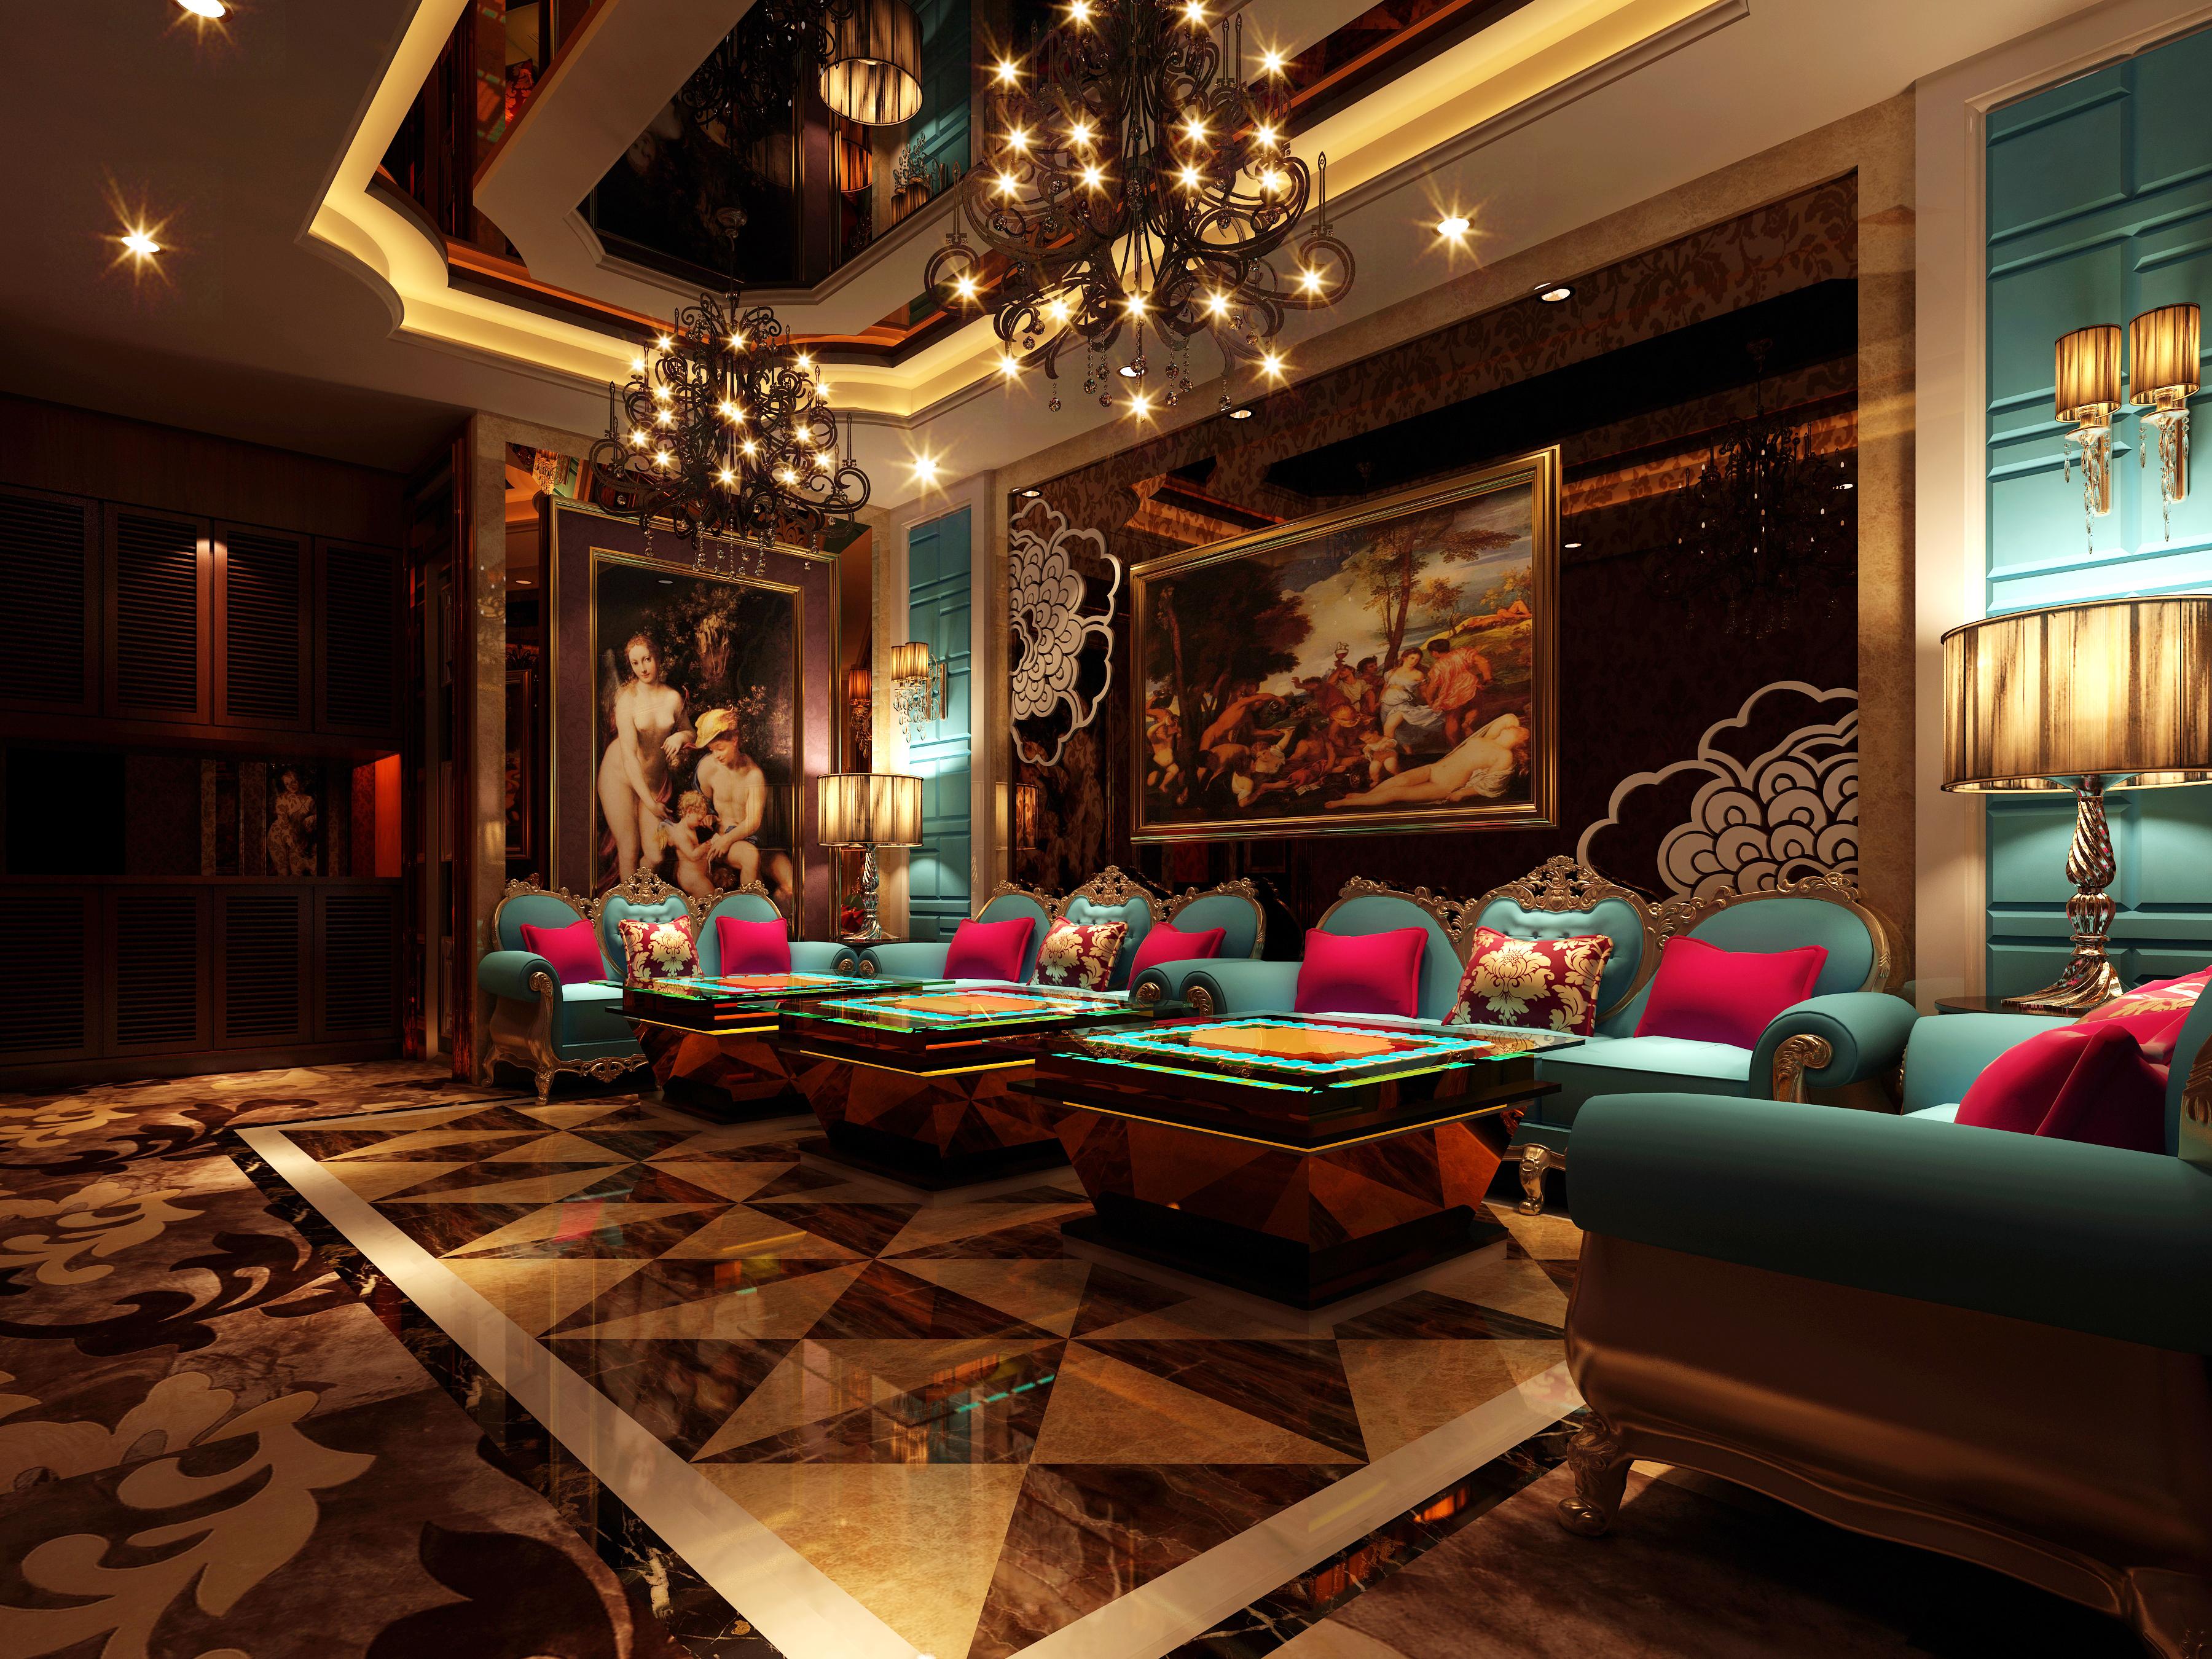 Luxurious Restaurant Vip Lounge 3d Model Max 1